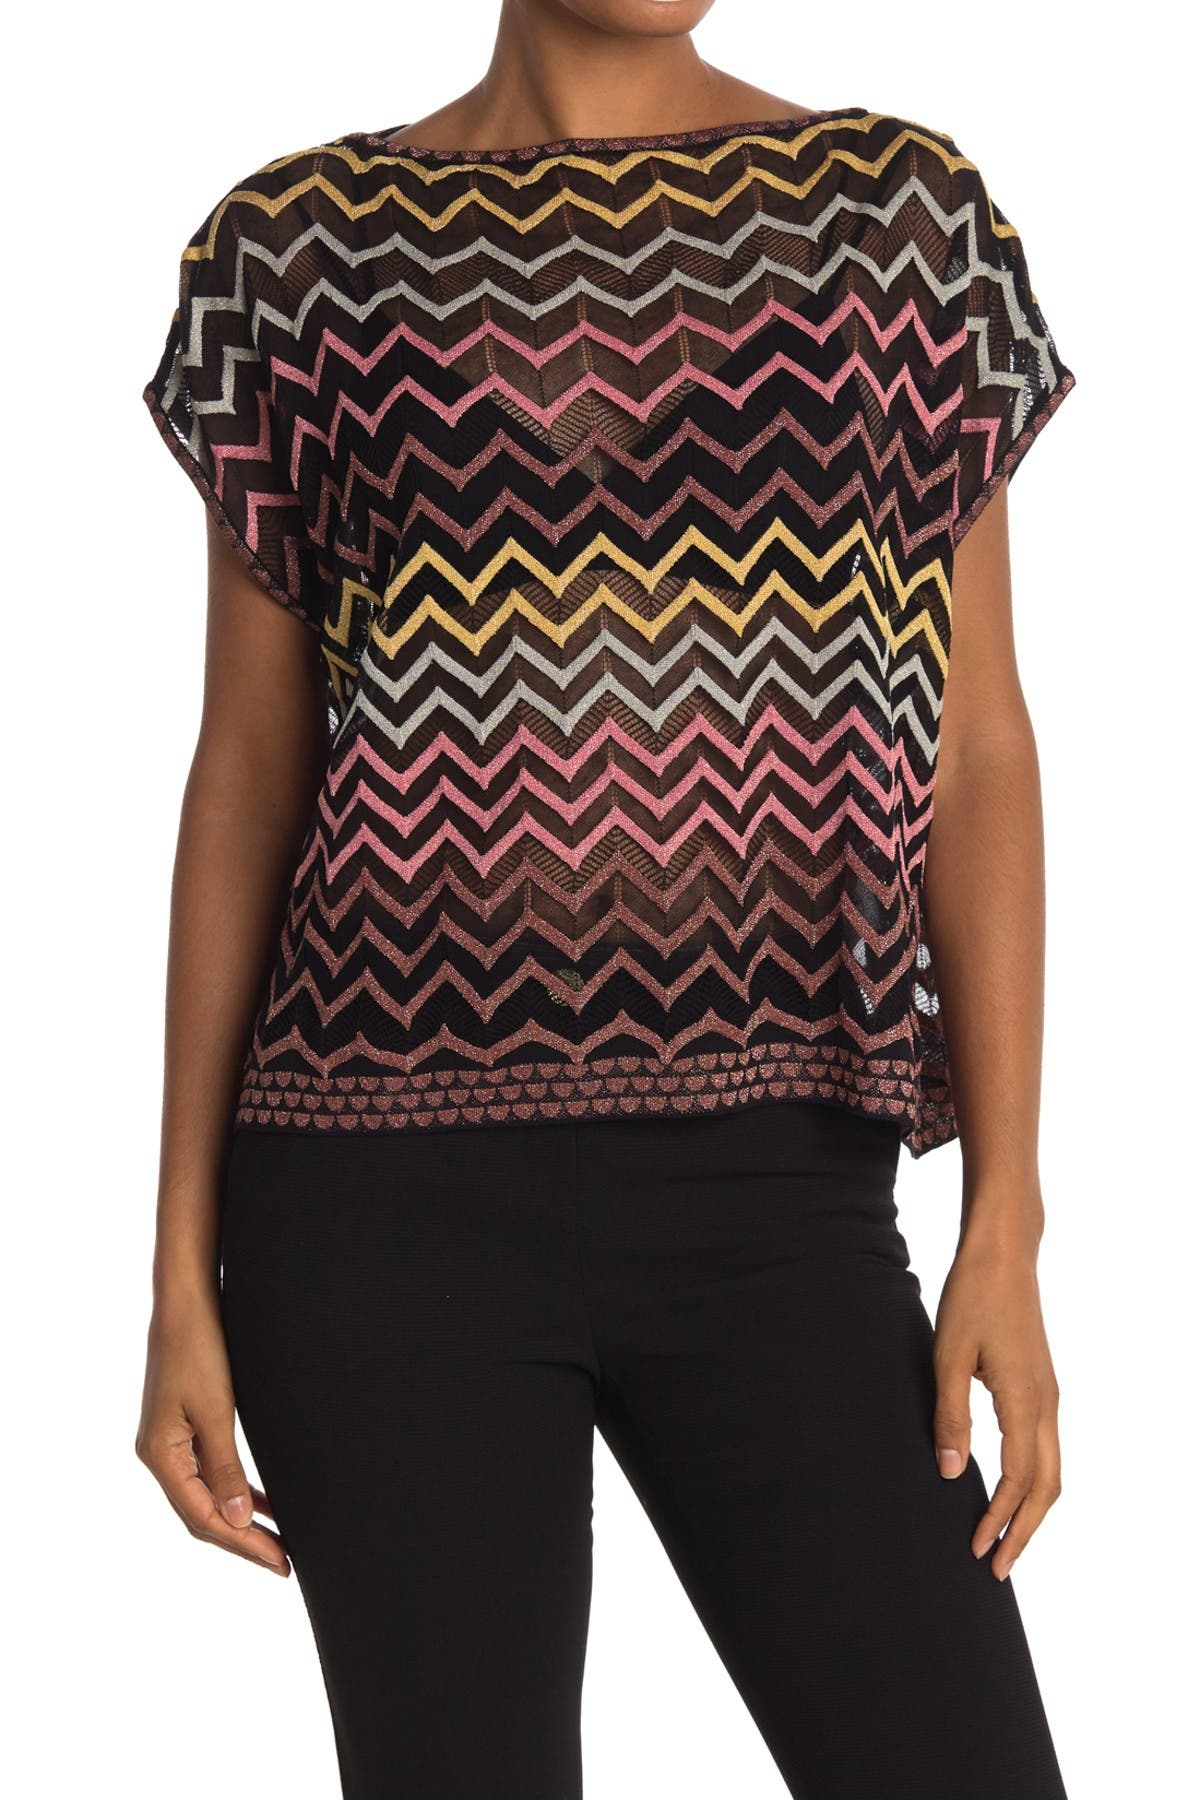 Image of M Missoni Boatneck Patterned Short Sleeve Sweater